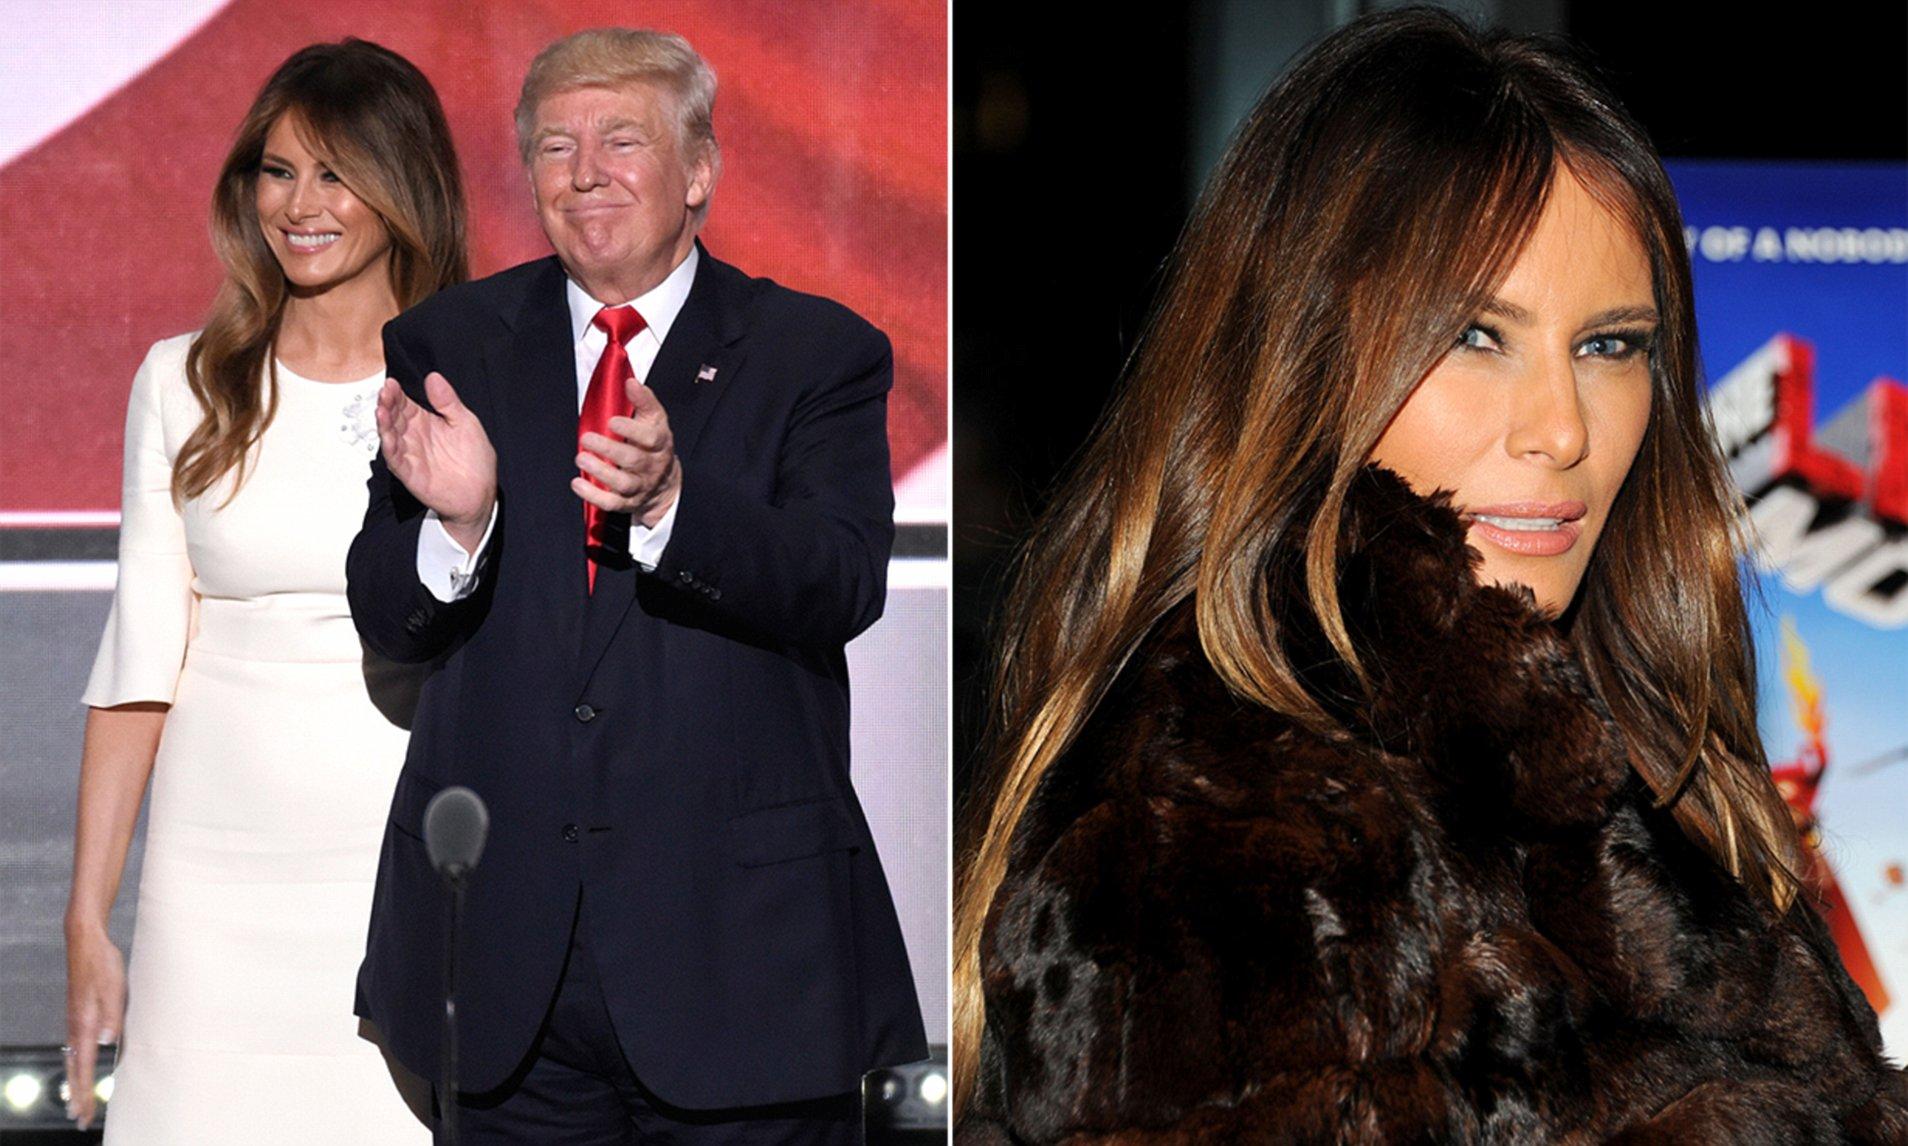 Dirty Scandalous Photos Of Melania Trump photo 26